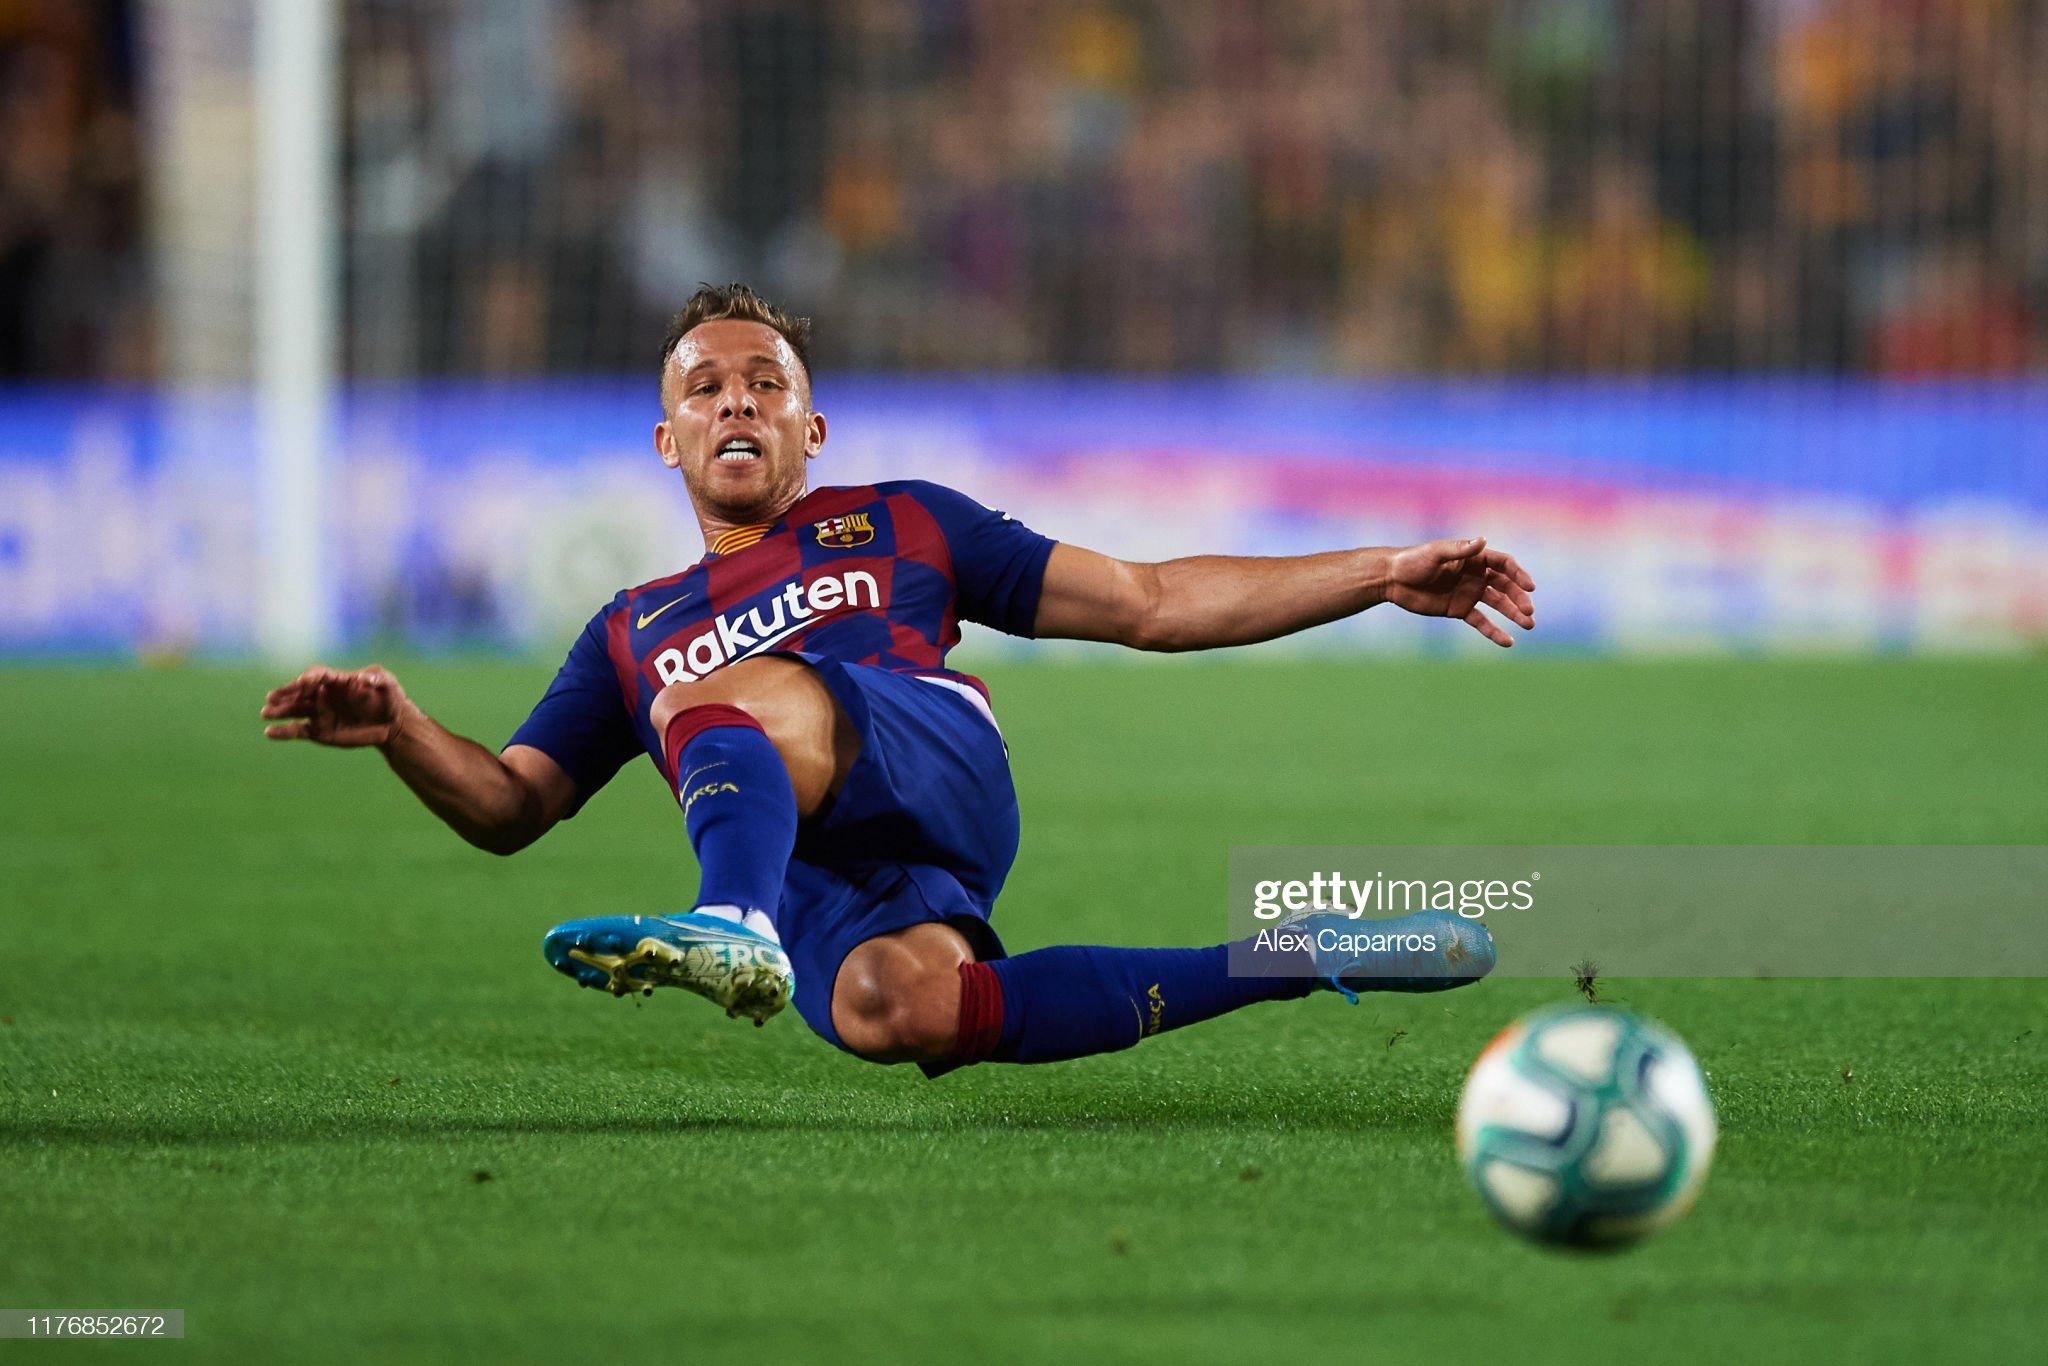 صور مباراة : برشلونة - فياريال 2-1 ( 24-09-2019 )  Arthur-melo-of-fc-barcelona-plays-the-ball-during-the-liga-match-fc-picture-id1176852672?s=2048x2048